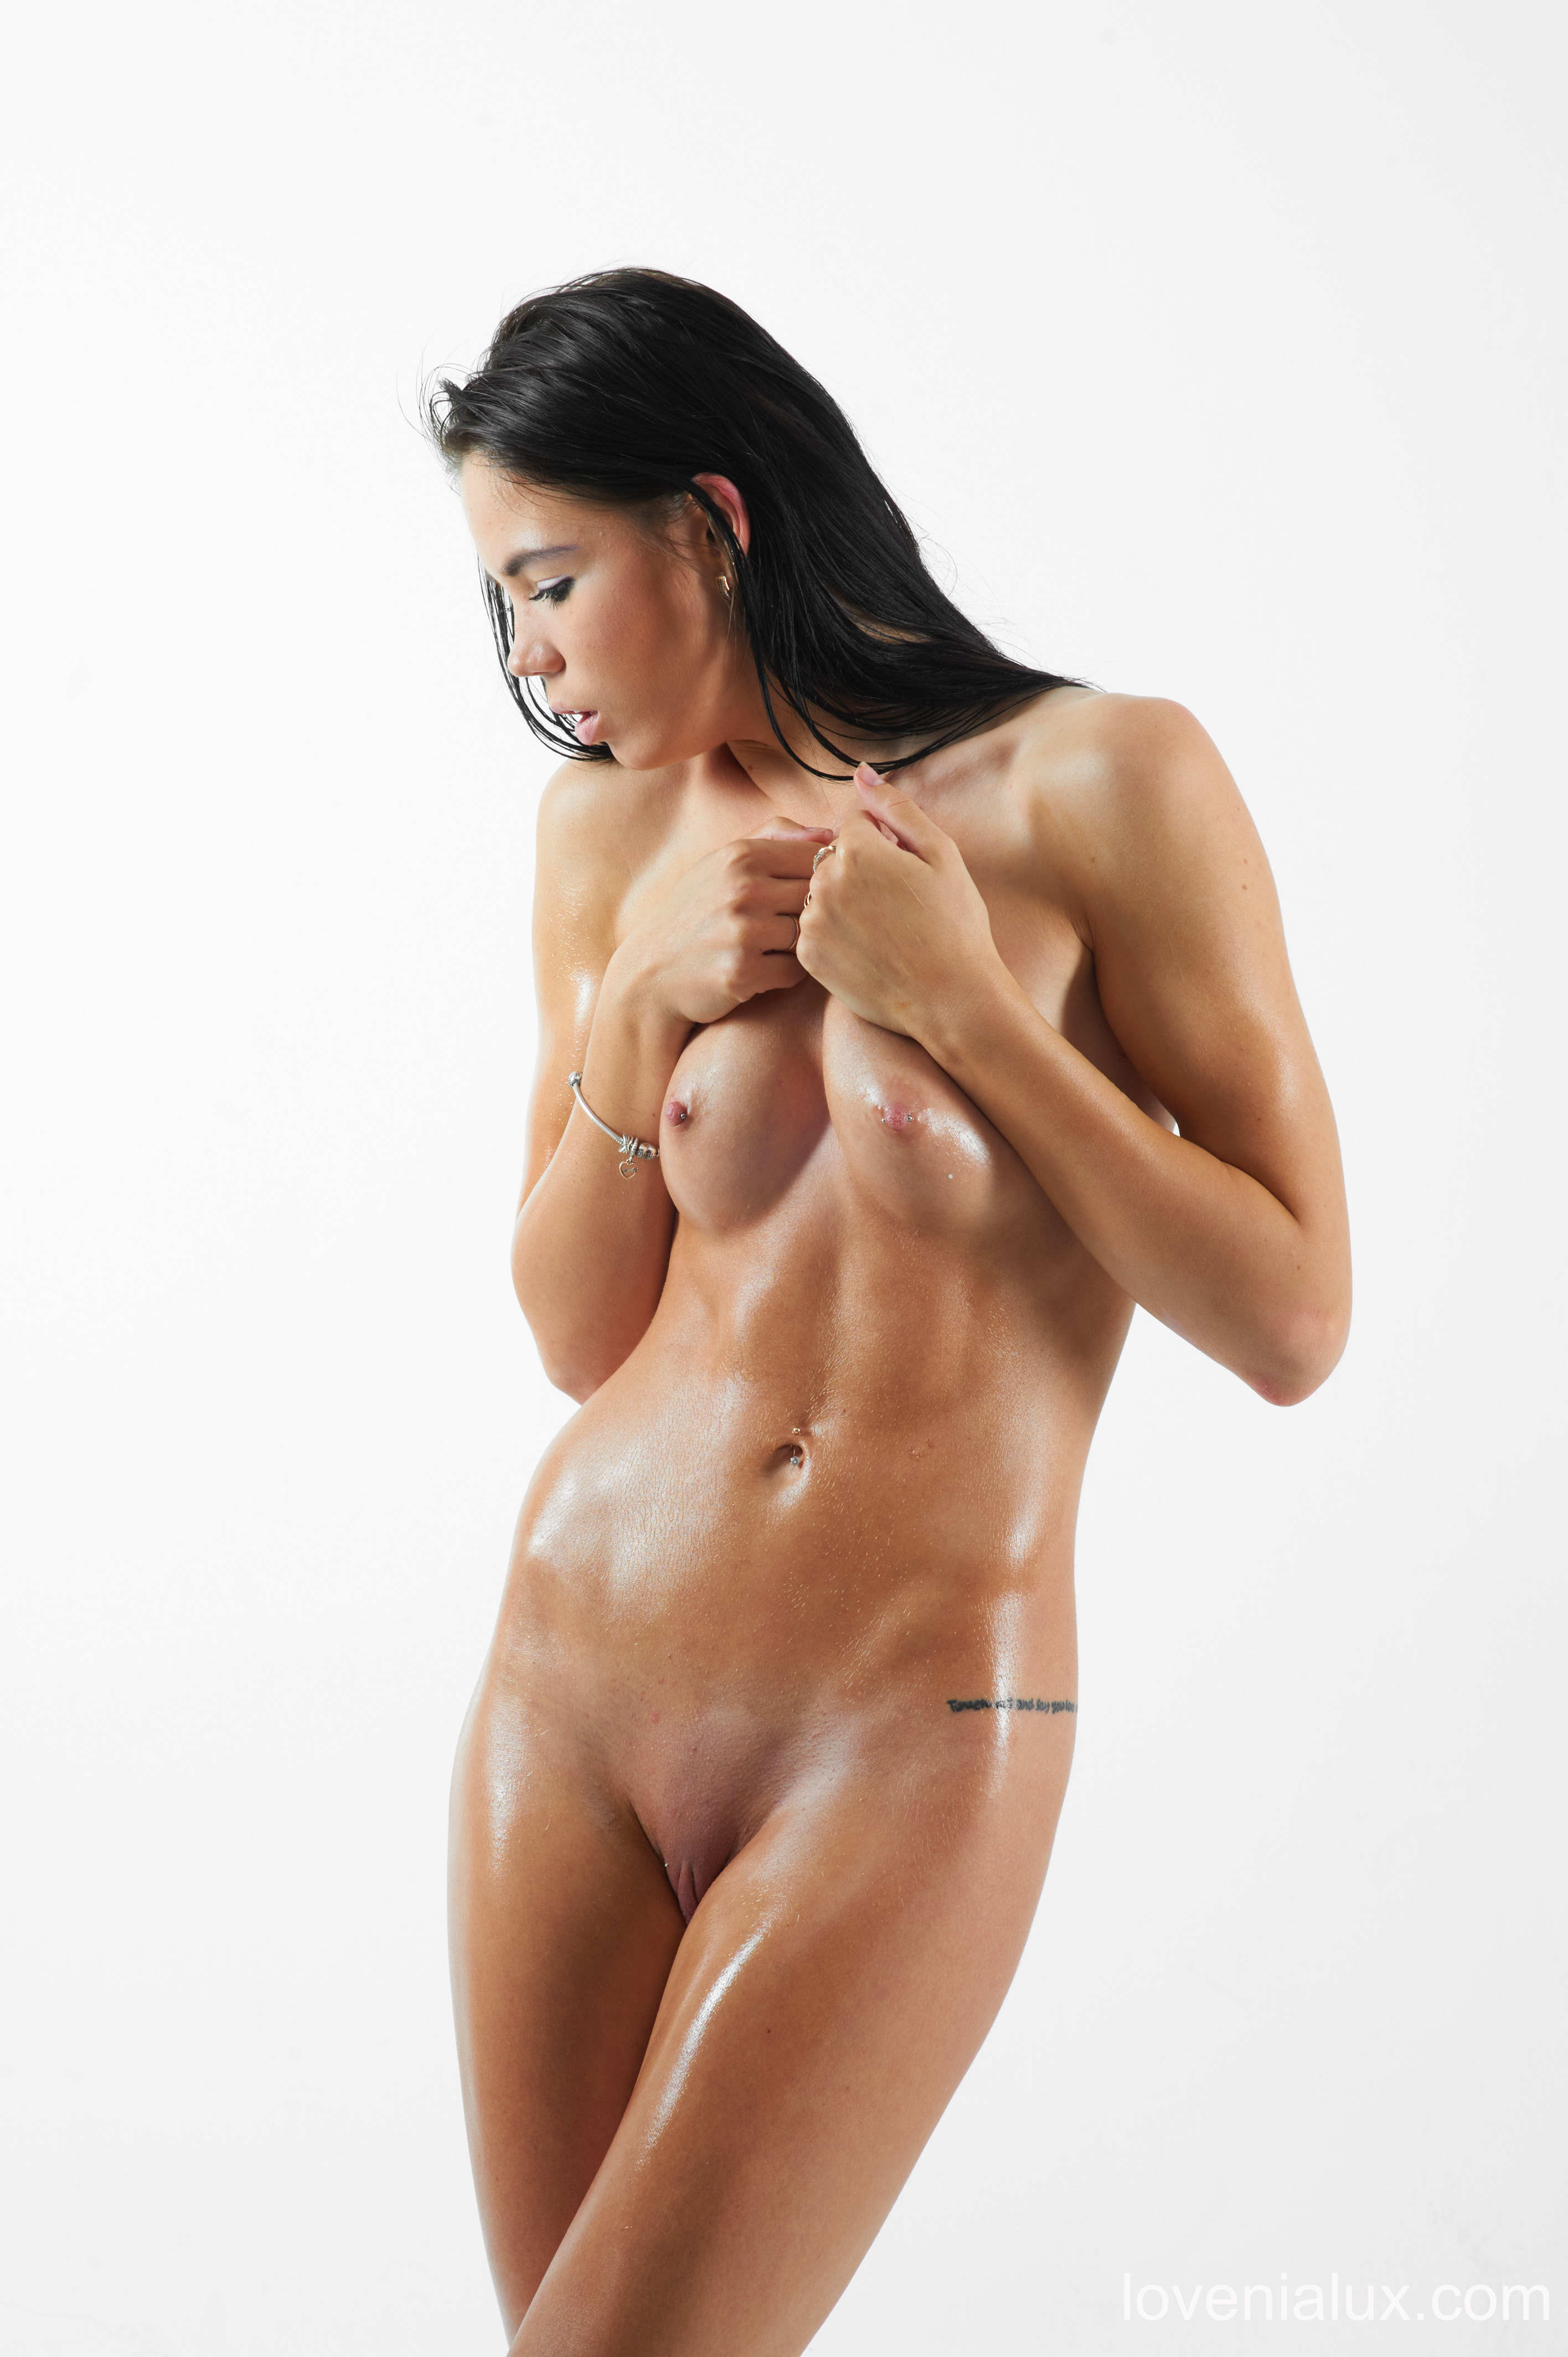 Fucking Pics Erotic massage tampa bay